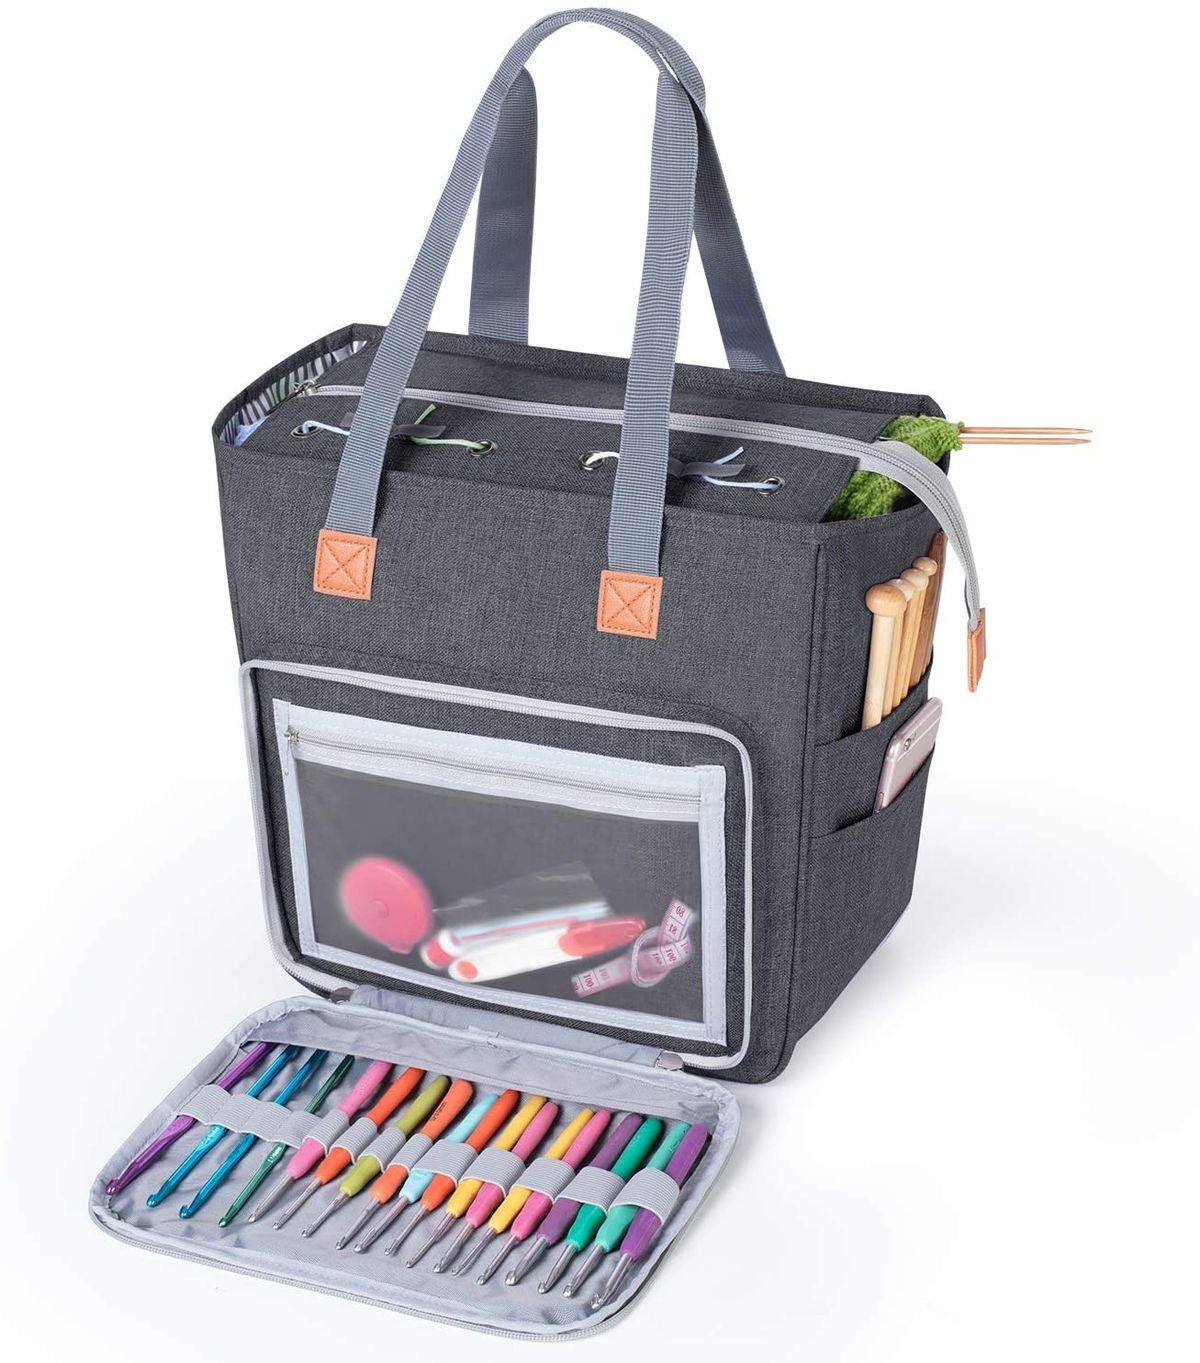 Portable Knitting Bag Wool Crochet Hooks Thread Yarn Storage Bag Sewing Needles Organizer Sewing Accessories Storage Gift